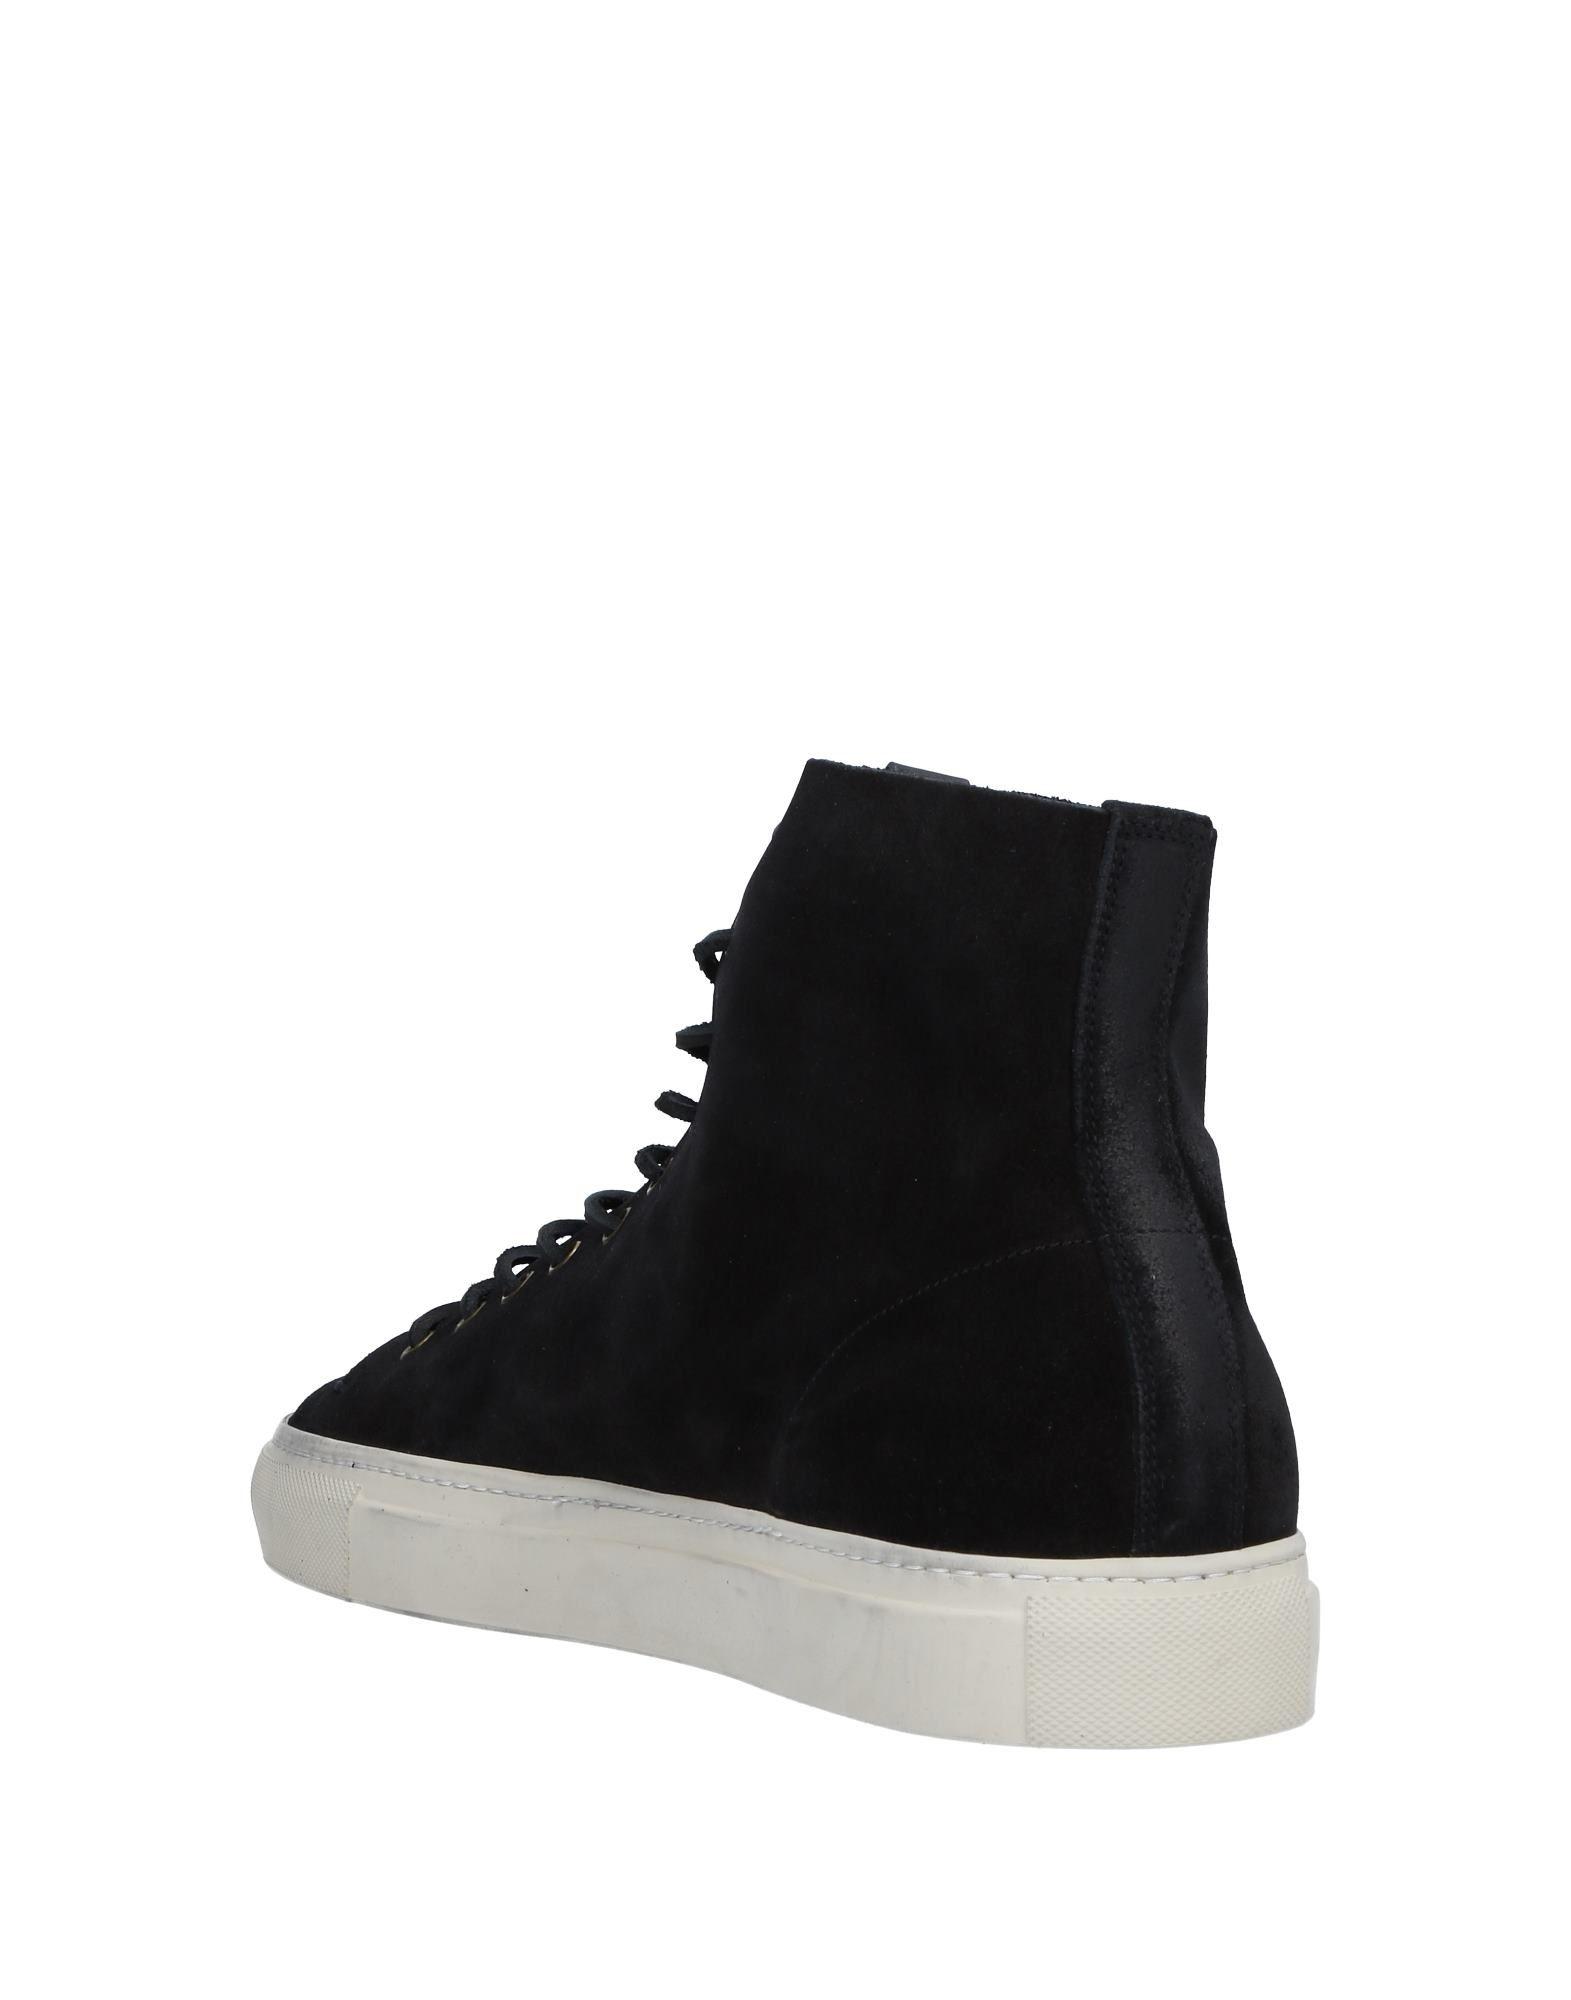 Buttero® Sneakers Herren  11533085MD Gute Qualität beliebte Schuhe